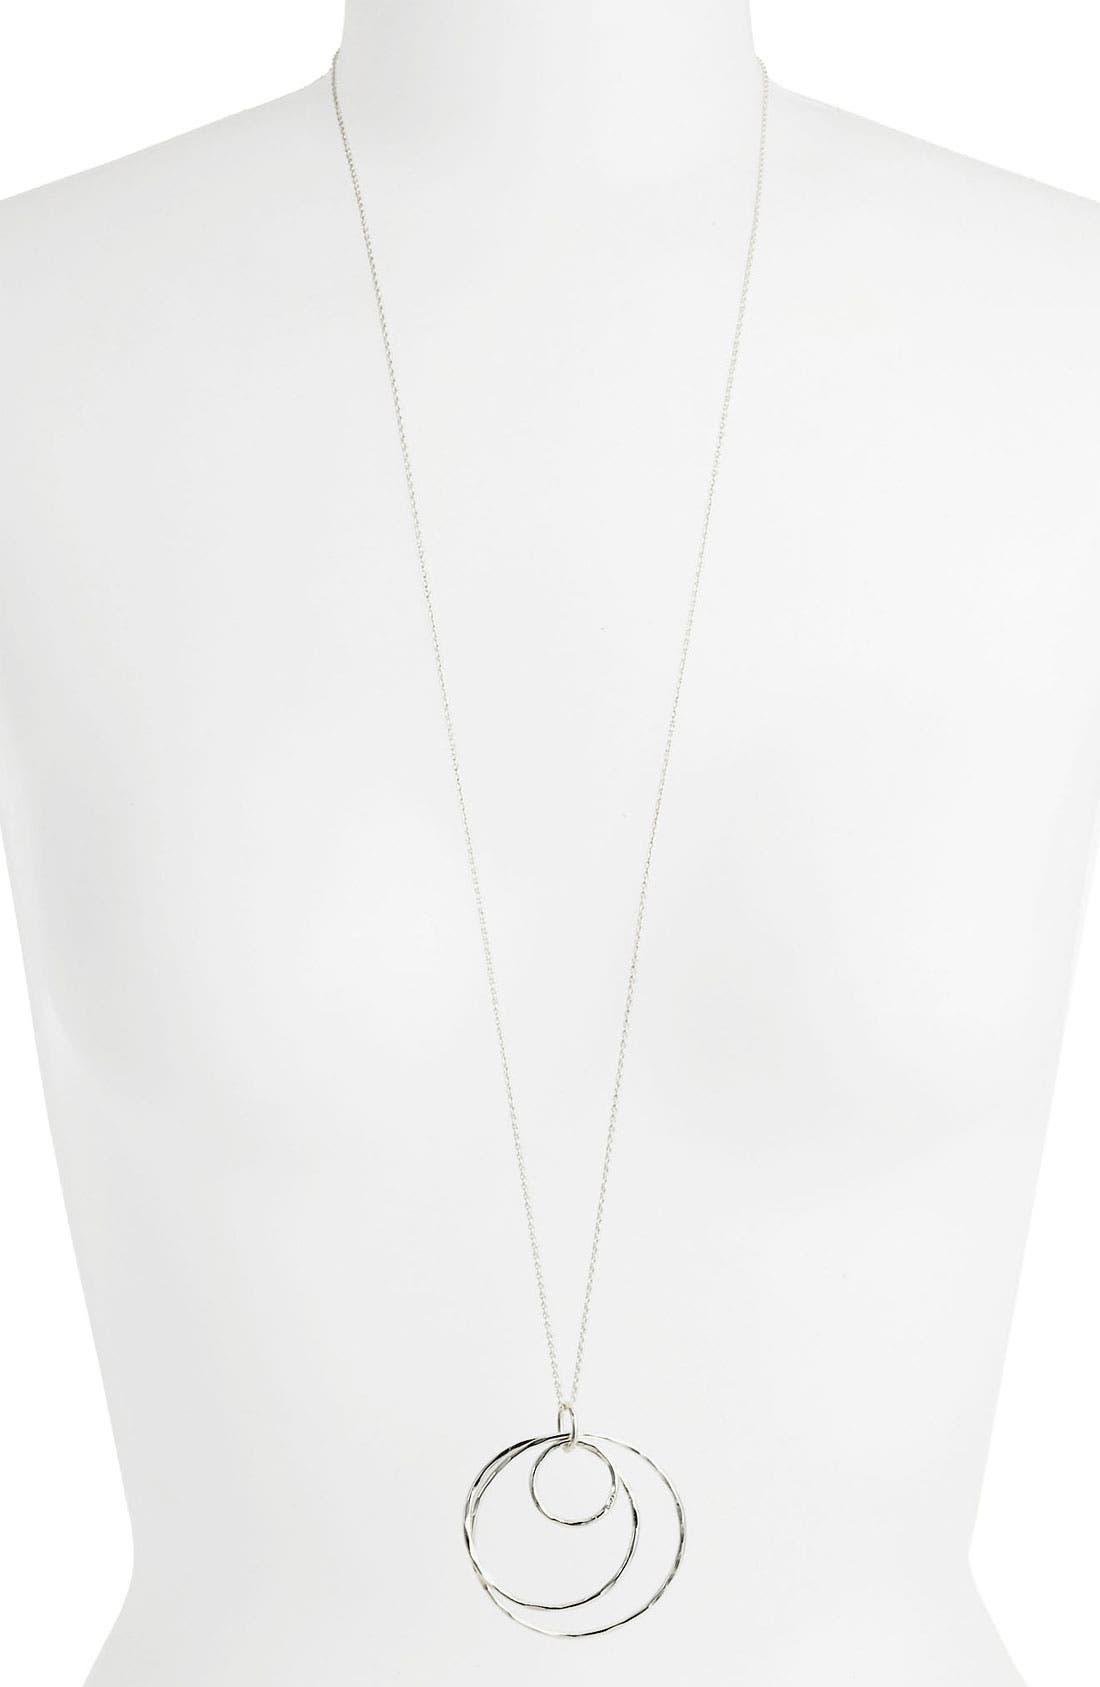 Main Image - Argento Vivo Long Pendant Necklace